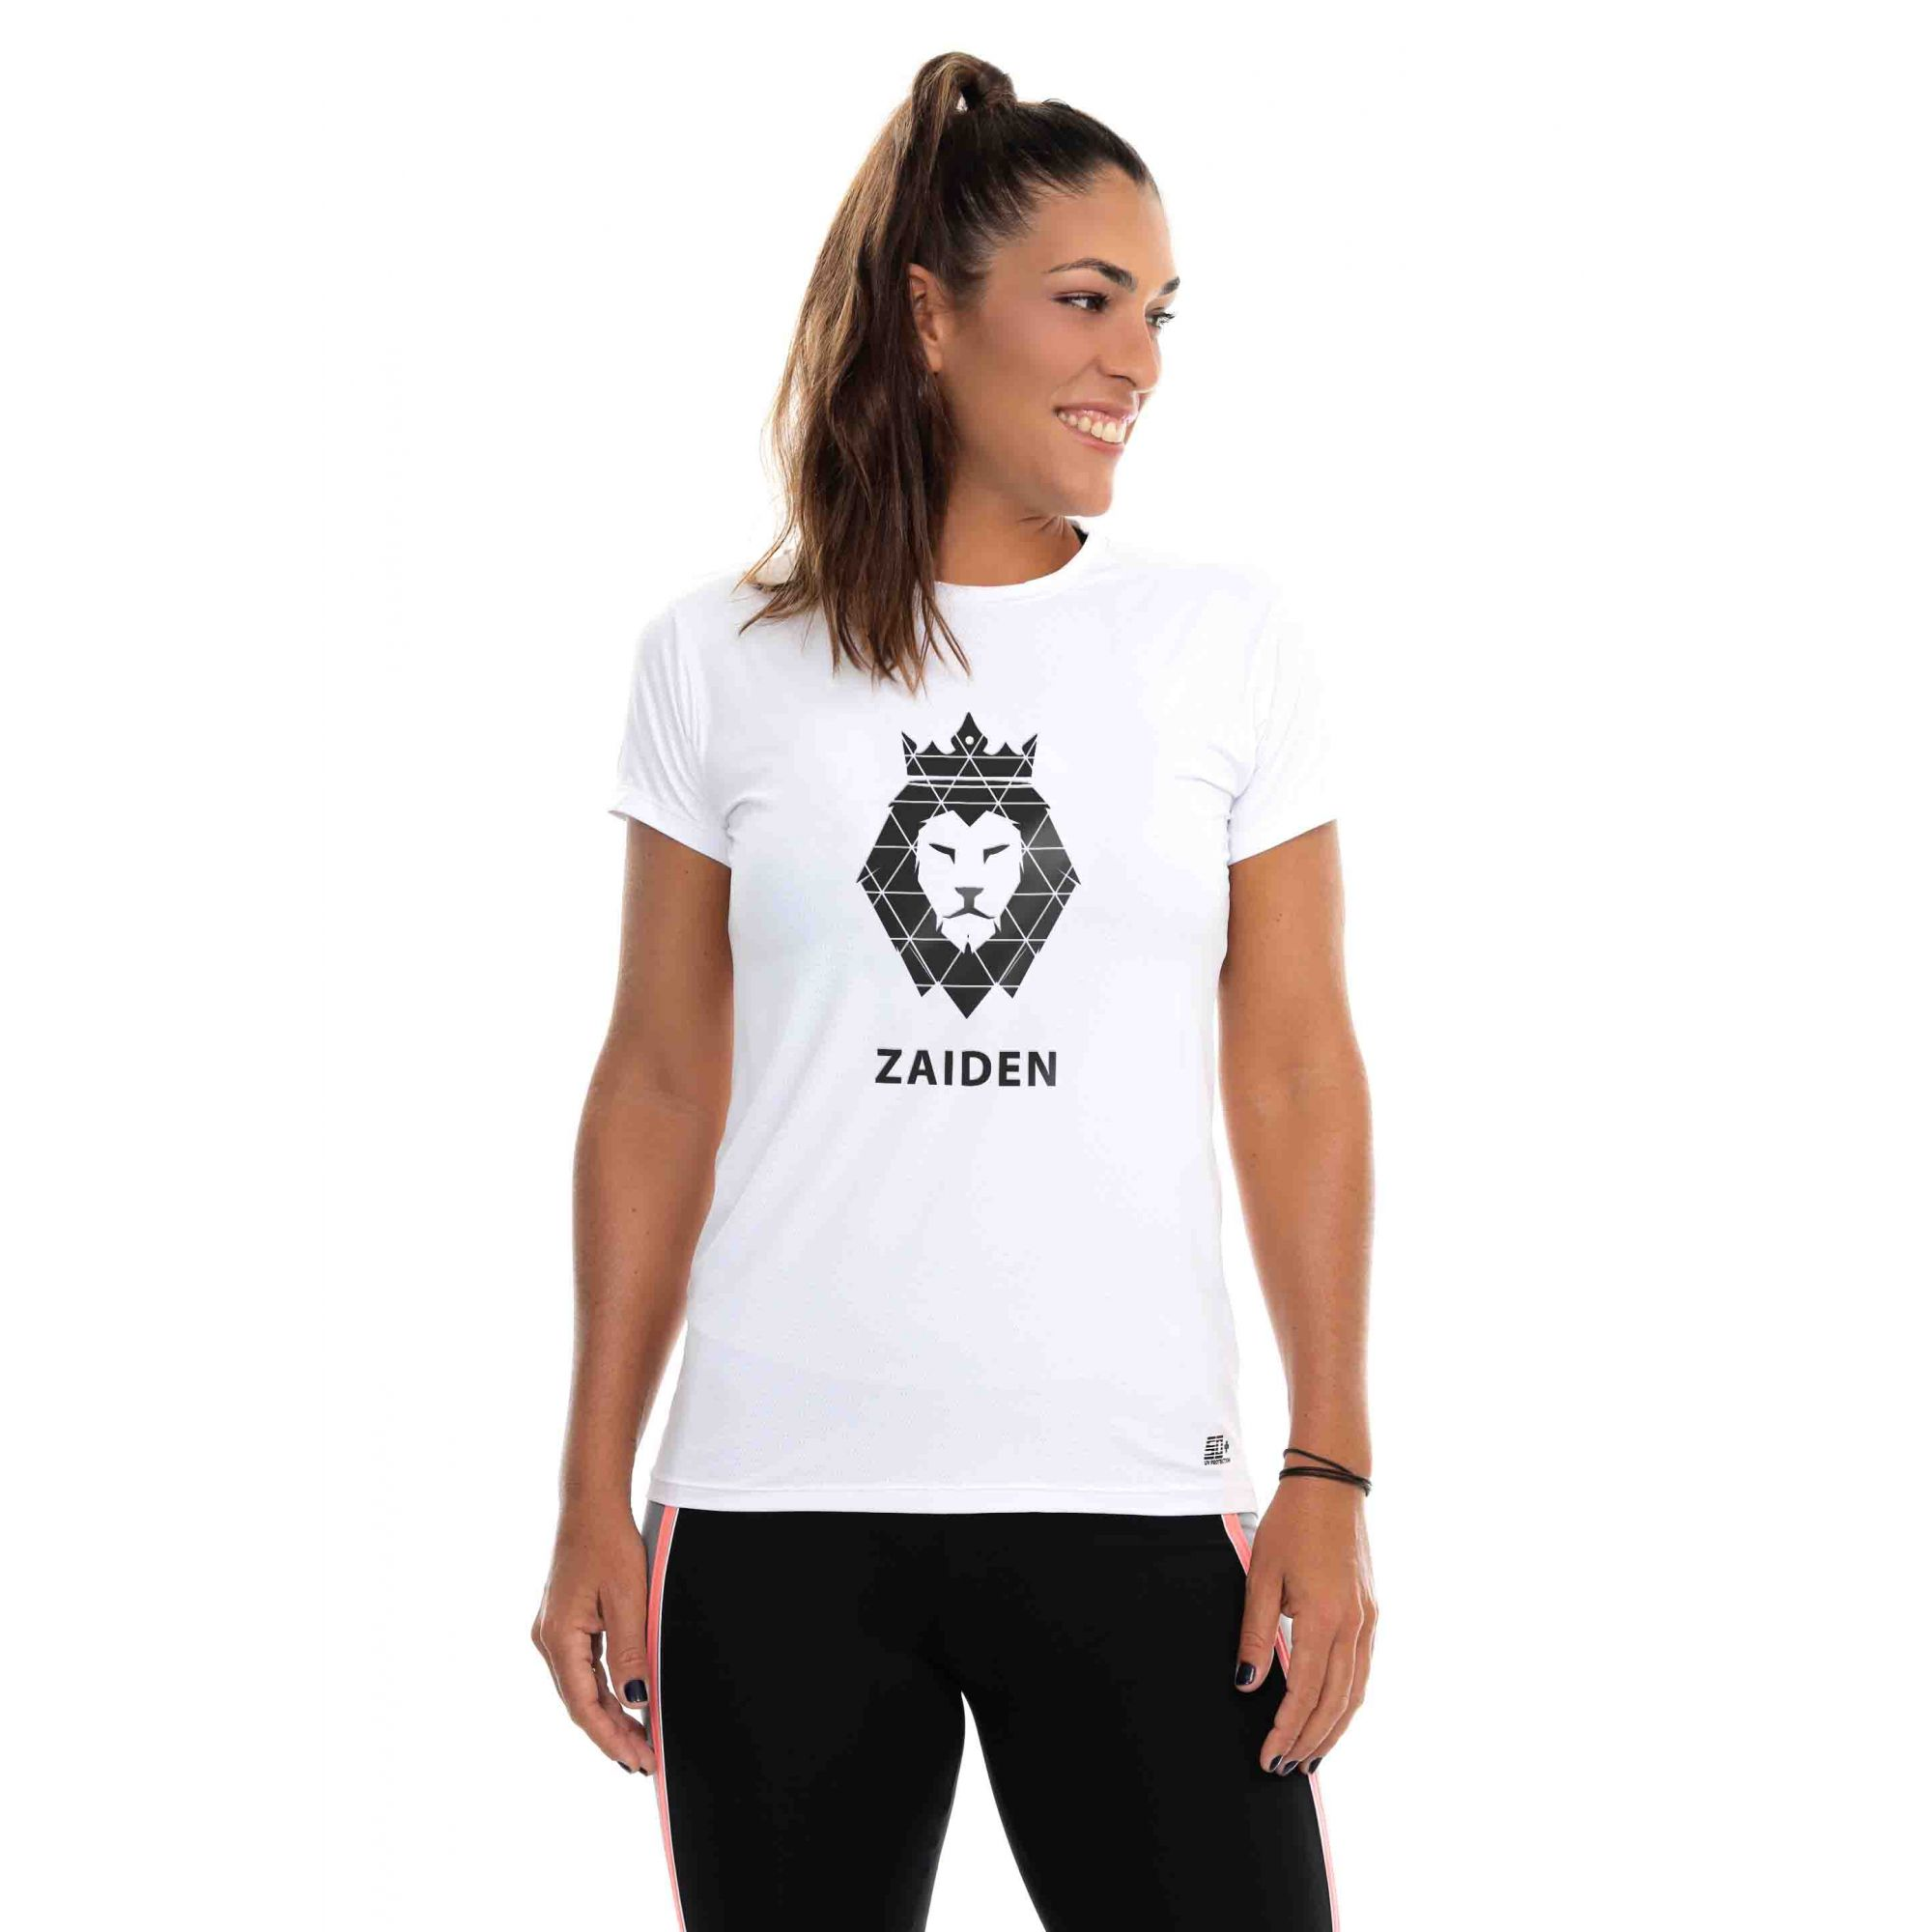 Camiseta Feminina Poliamida Branca ZAIDEN Leão Preto